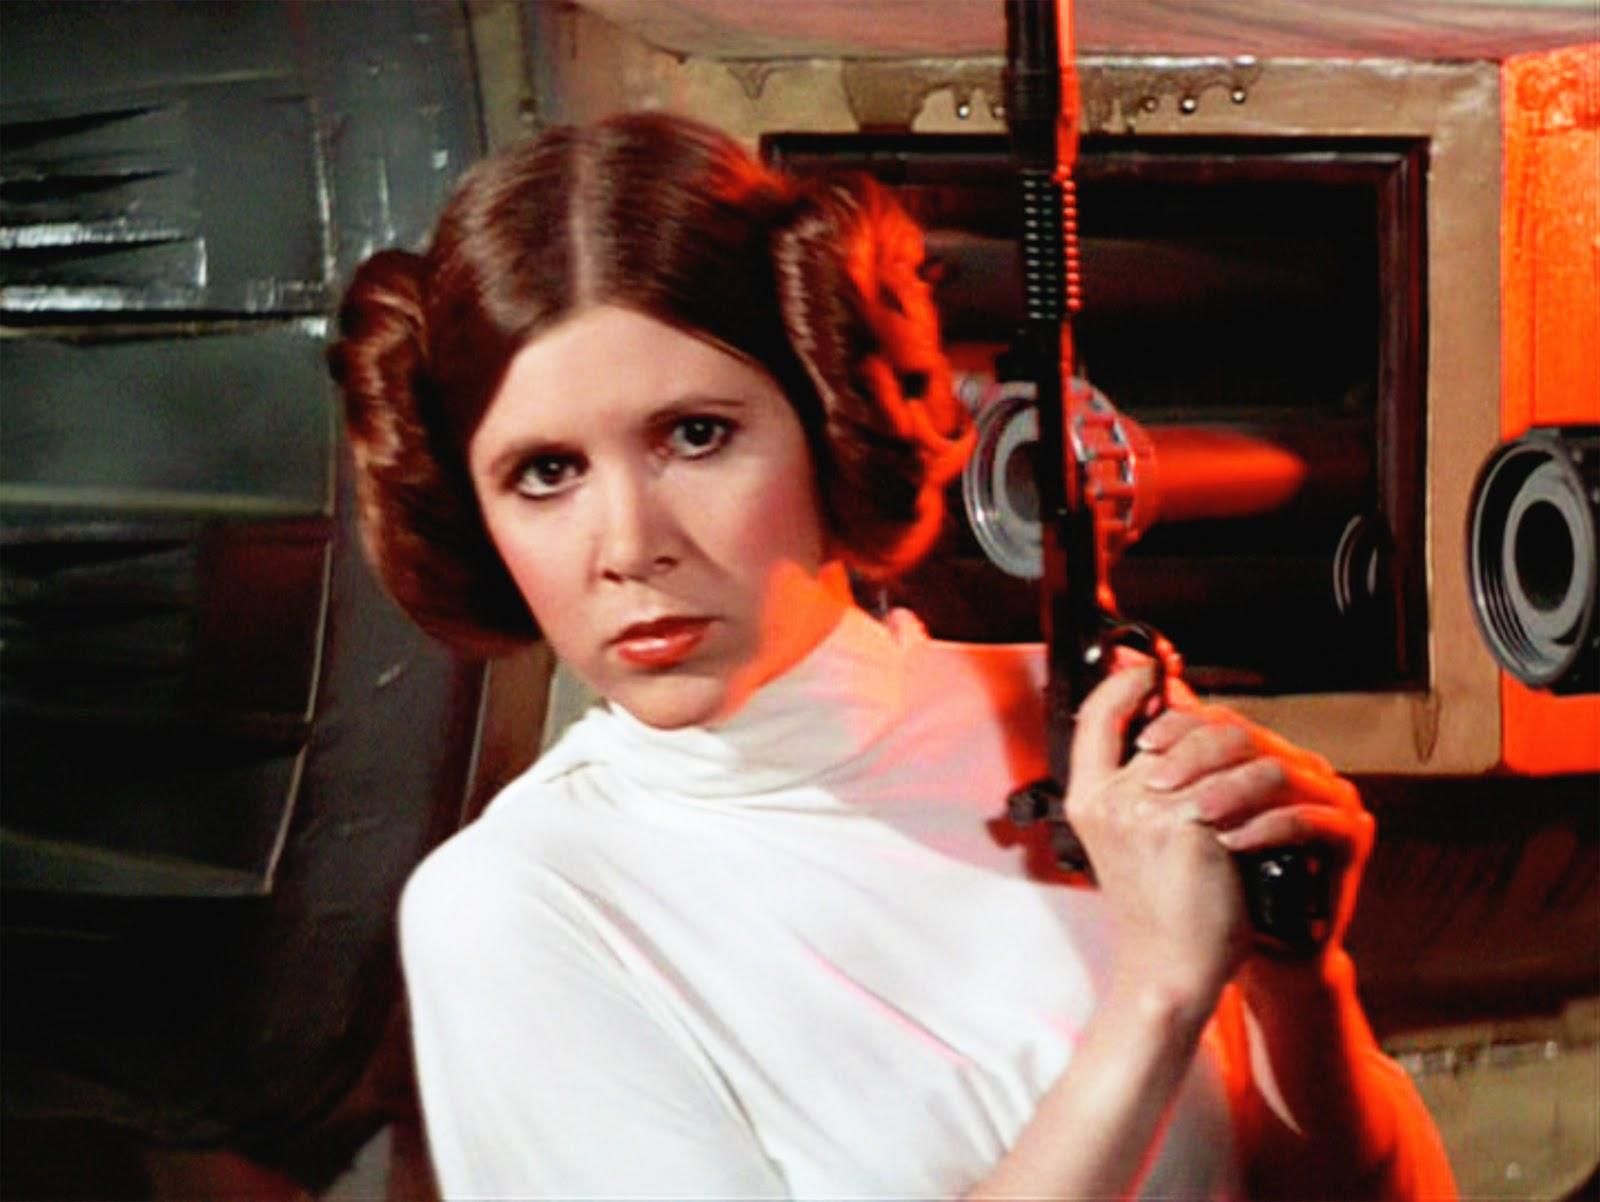 Princess Leia – The Geek's Princess